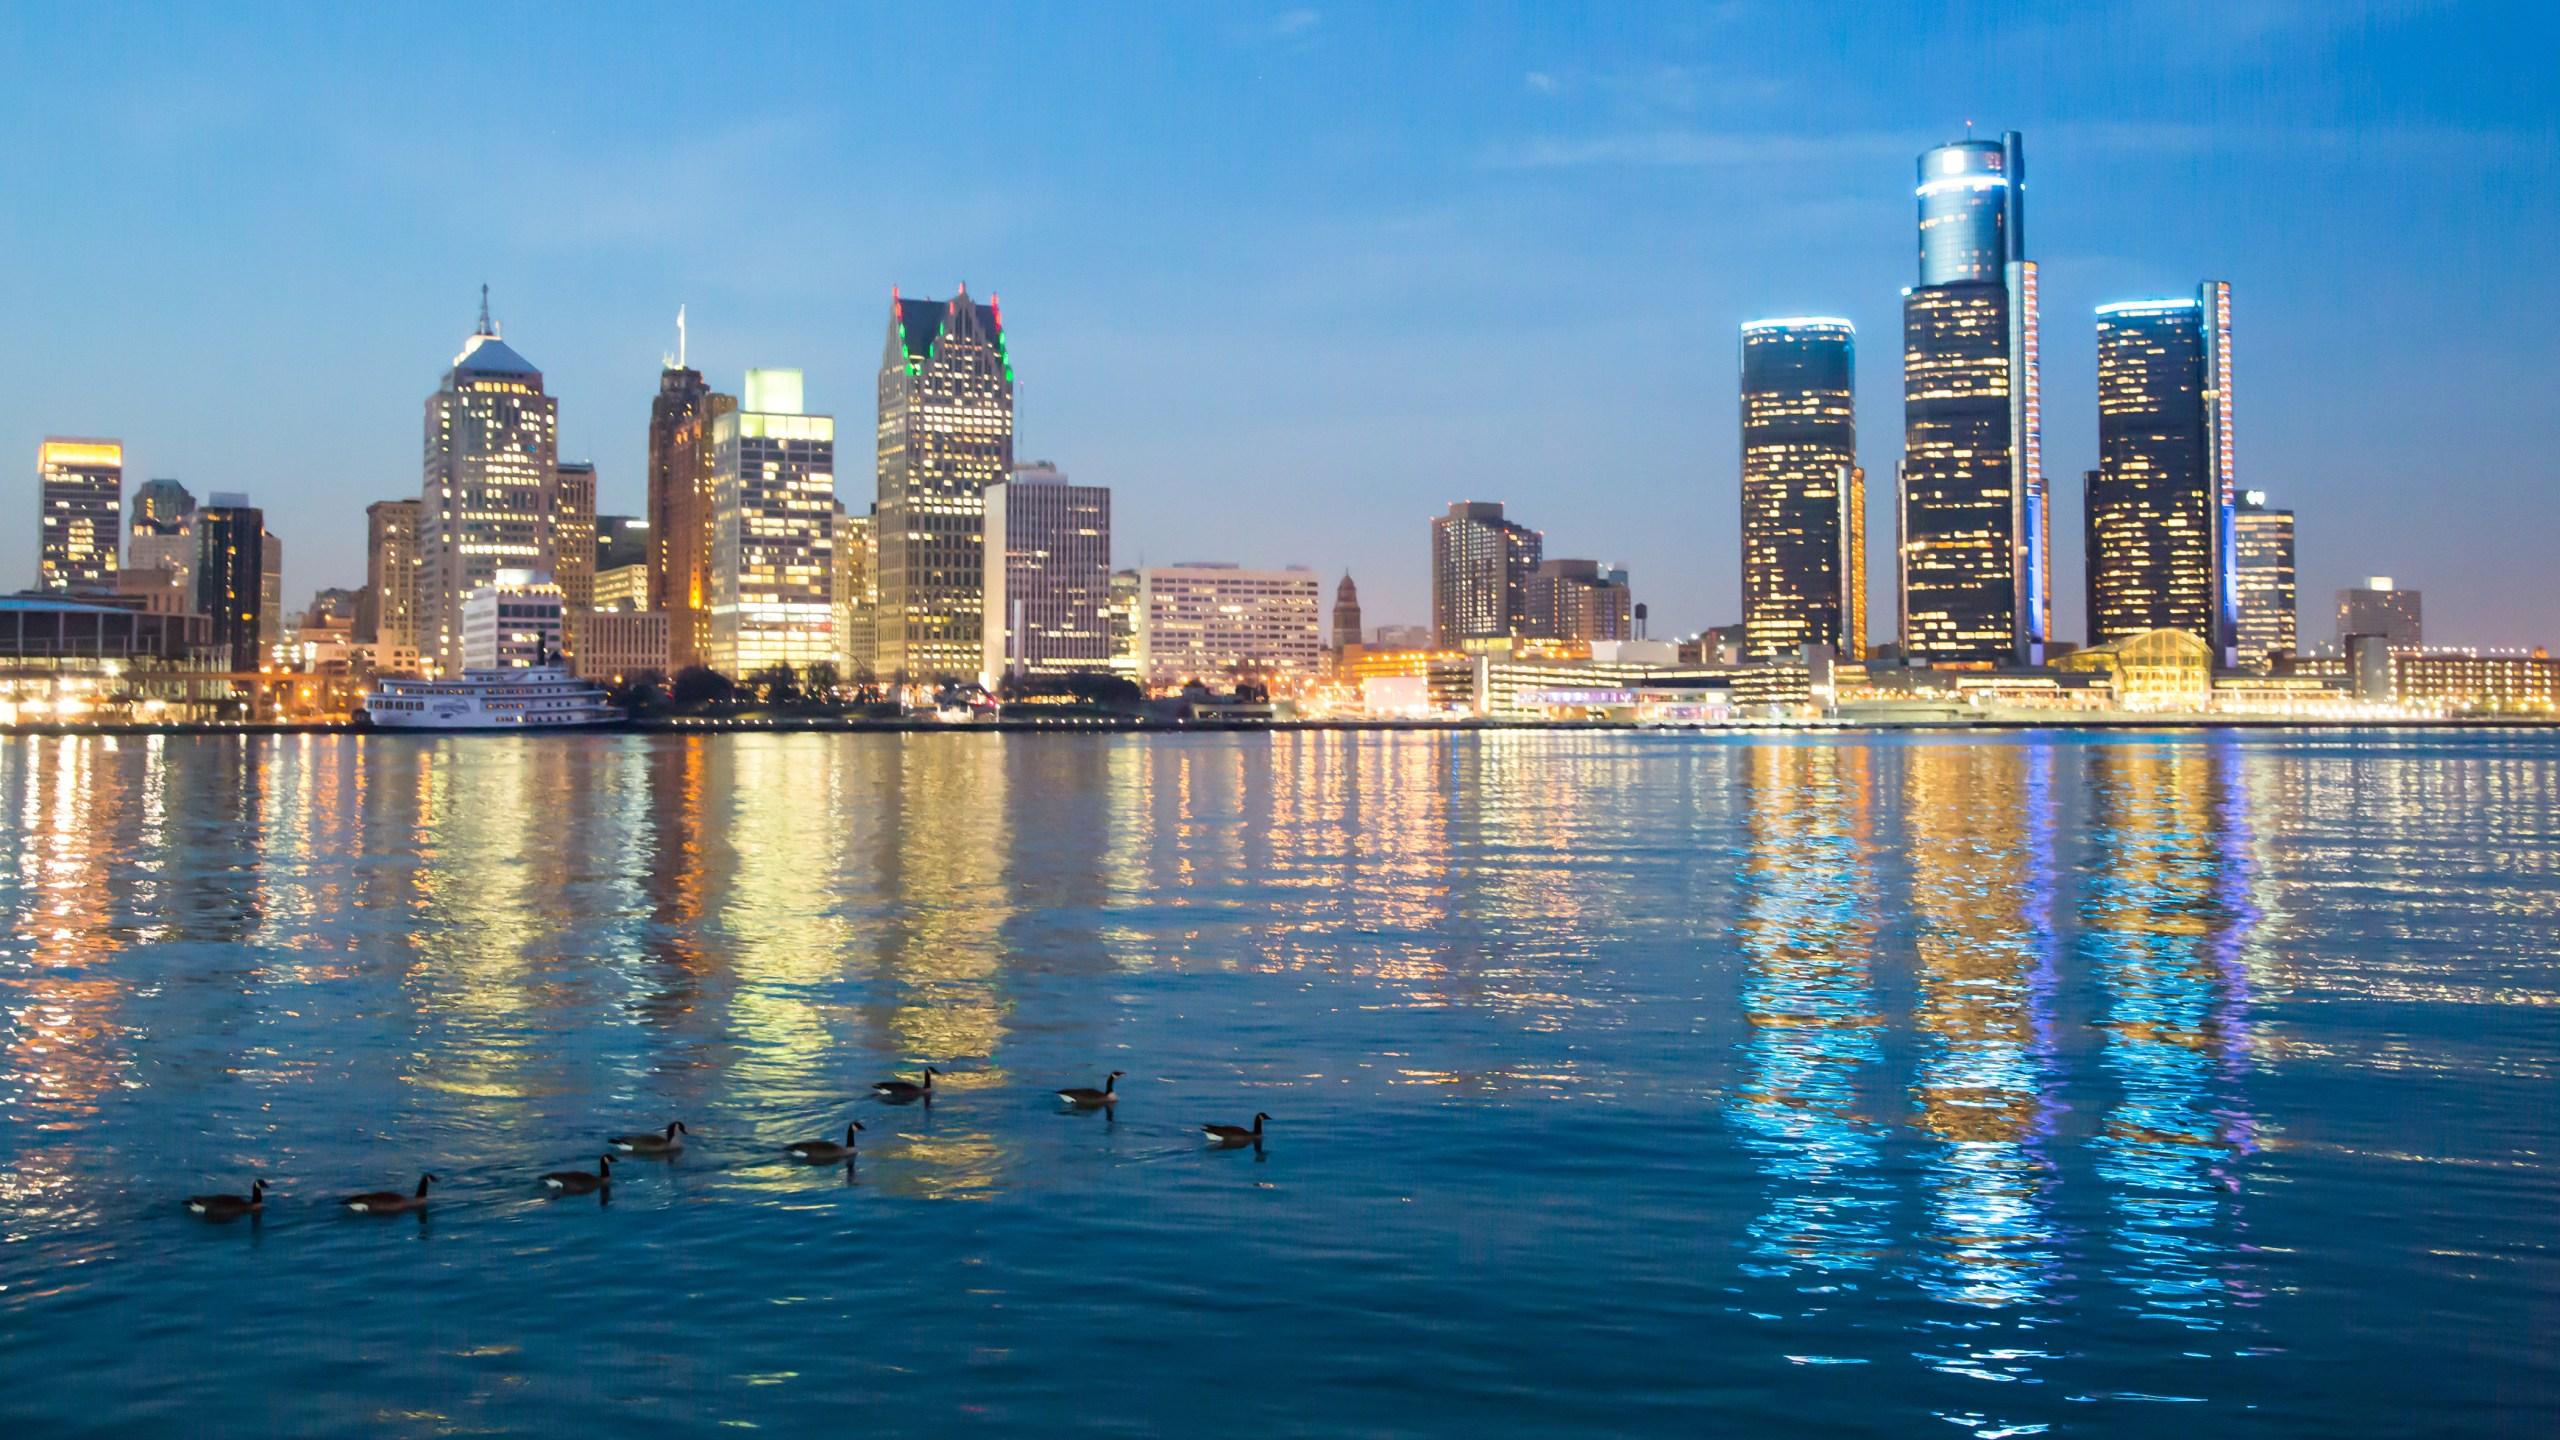 Detroit Skyline during evening_45231